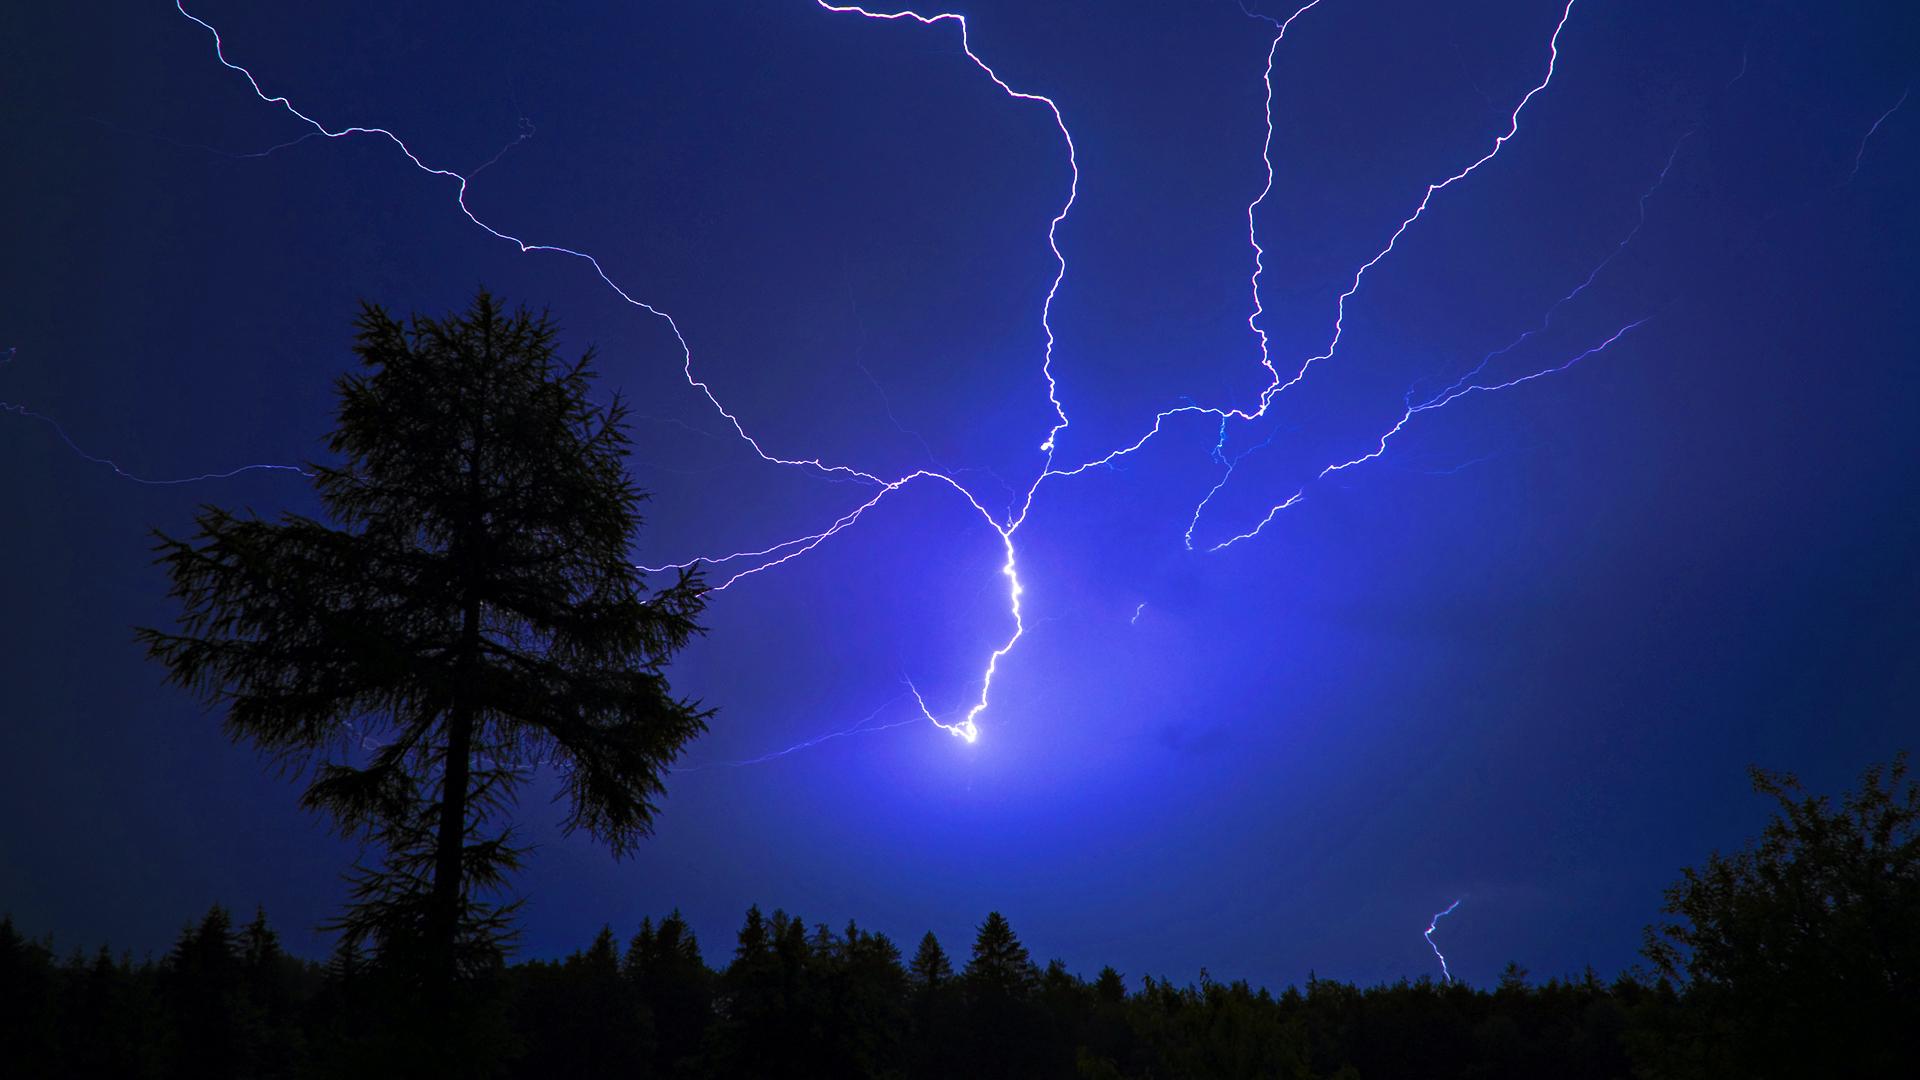 Thunderstorm Wallpapers for Desktop